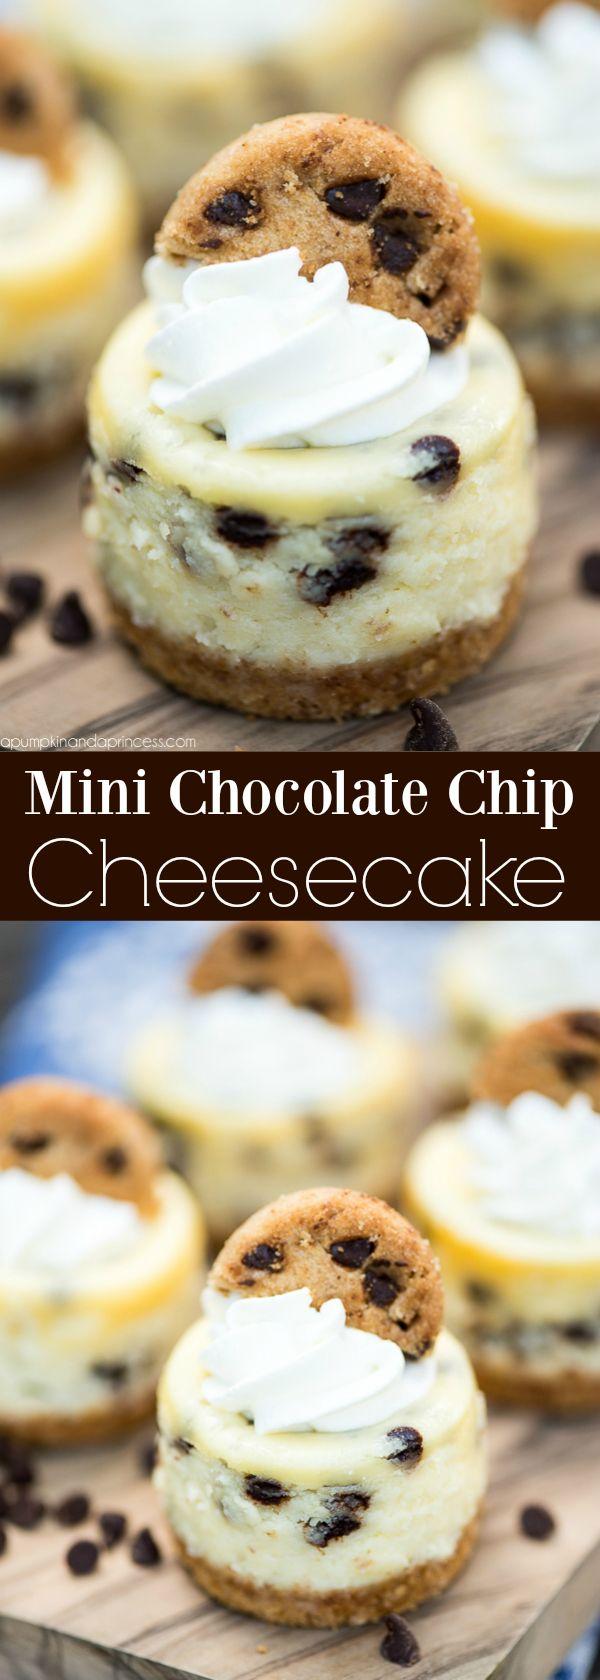 Mini Chocolate Chip Cheesecakes #cheesecakes